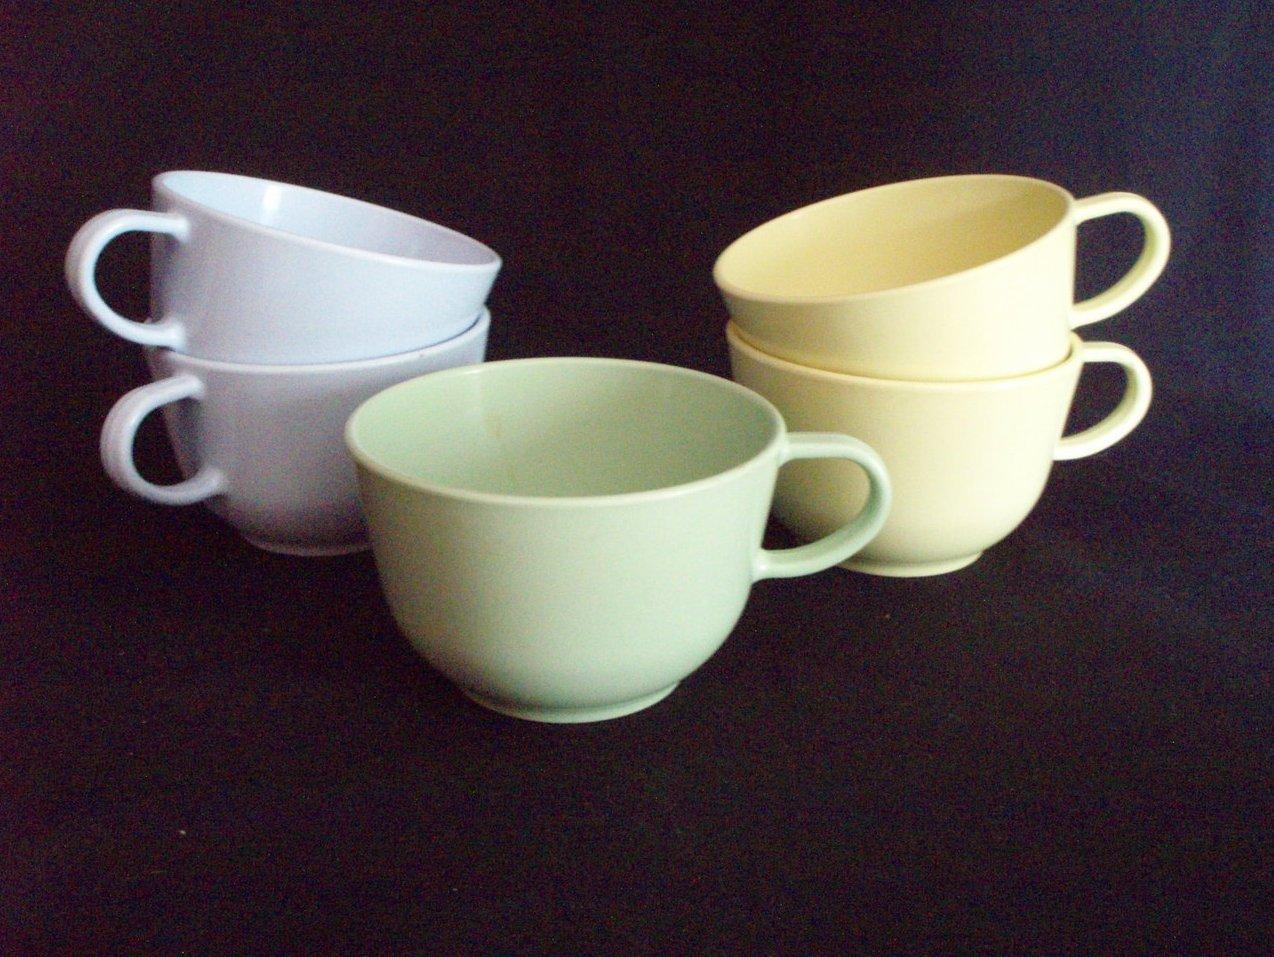 5 vintage hemcolite melmac plastic mugs camping poolside